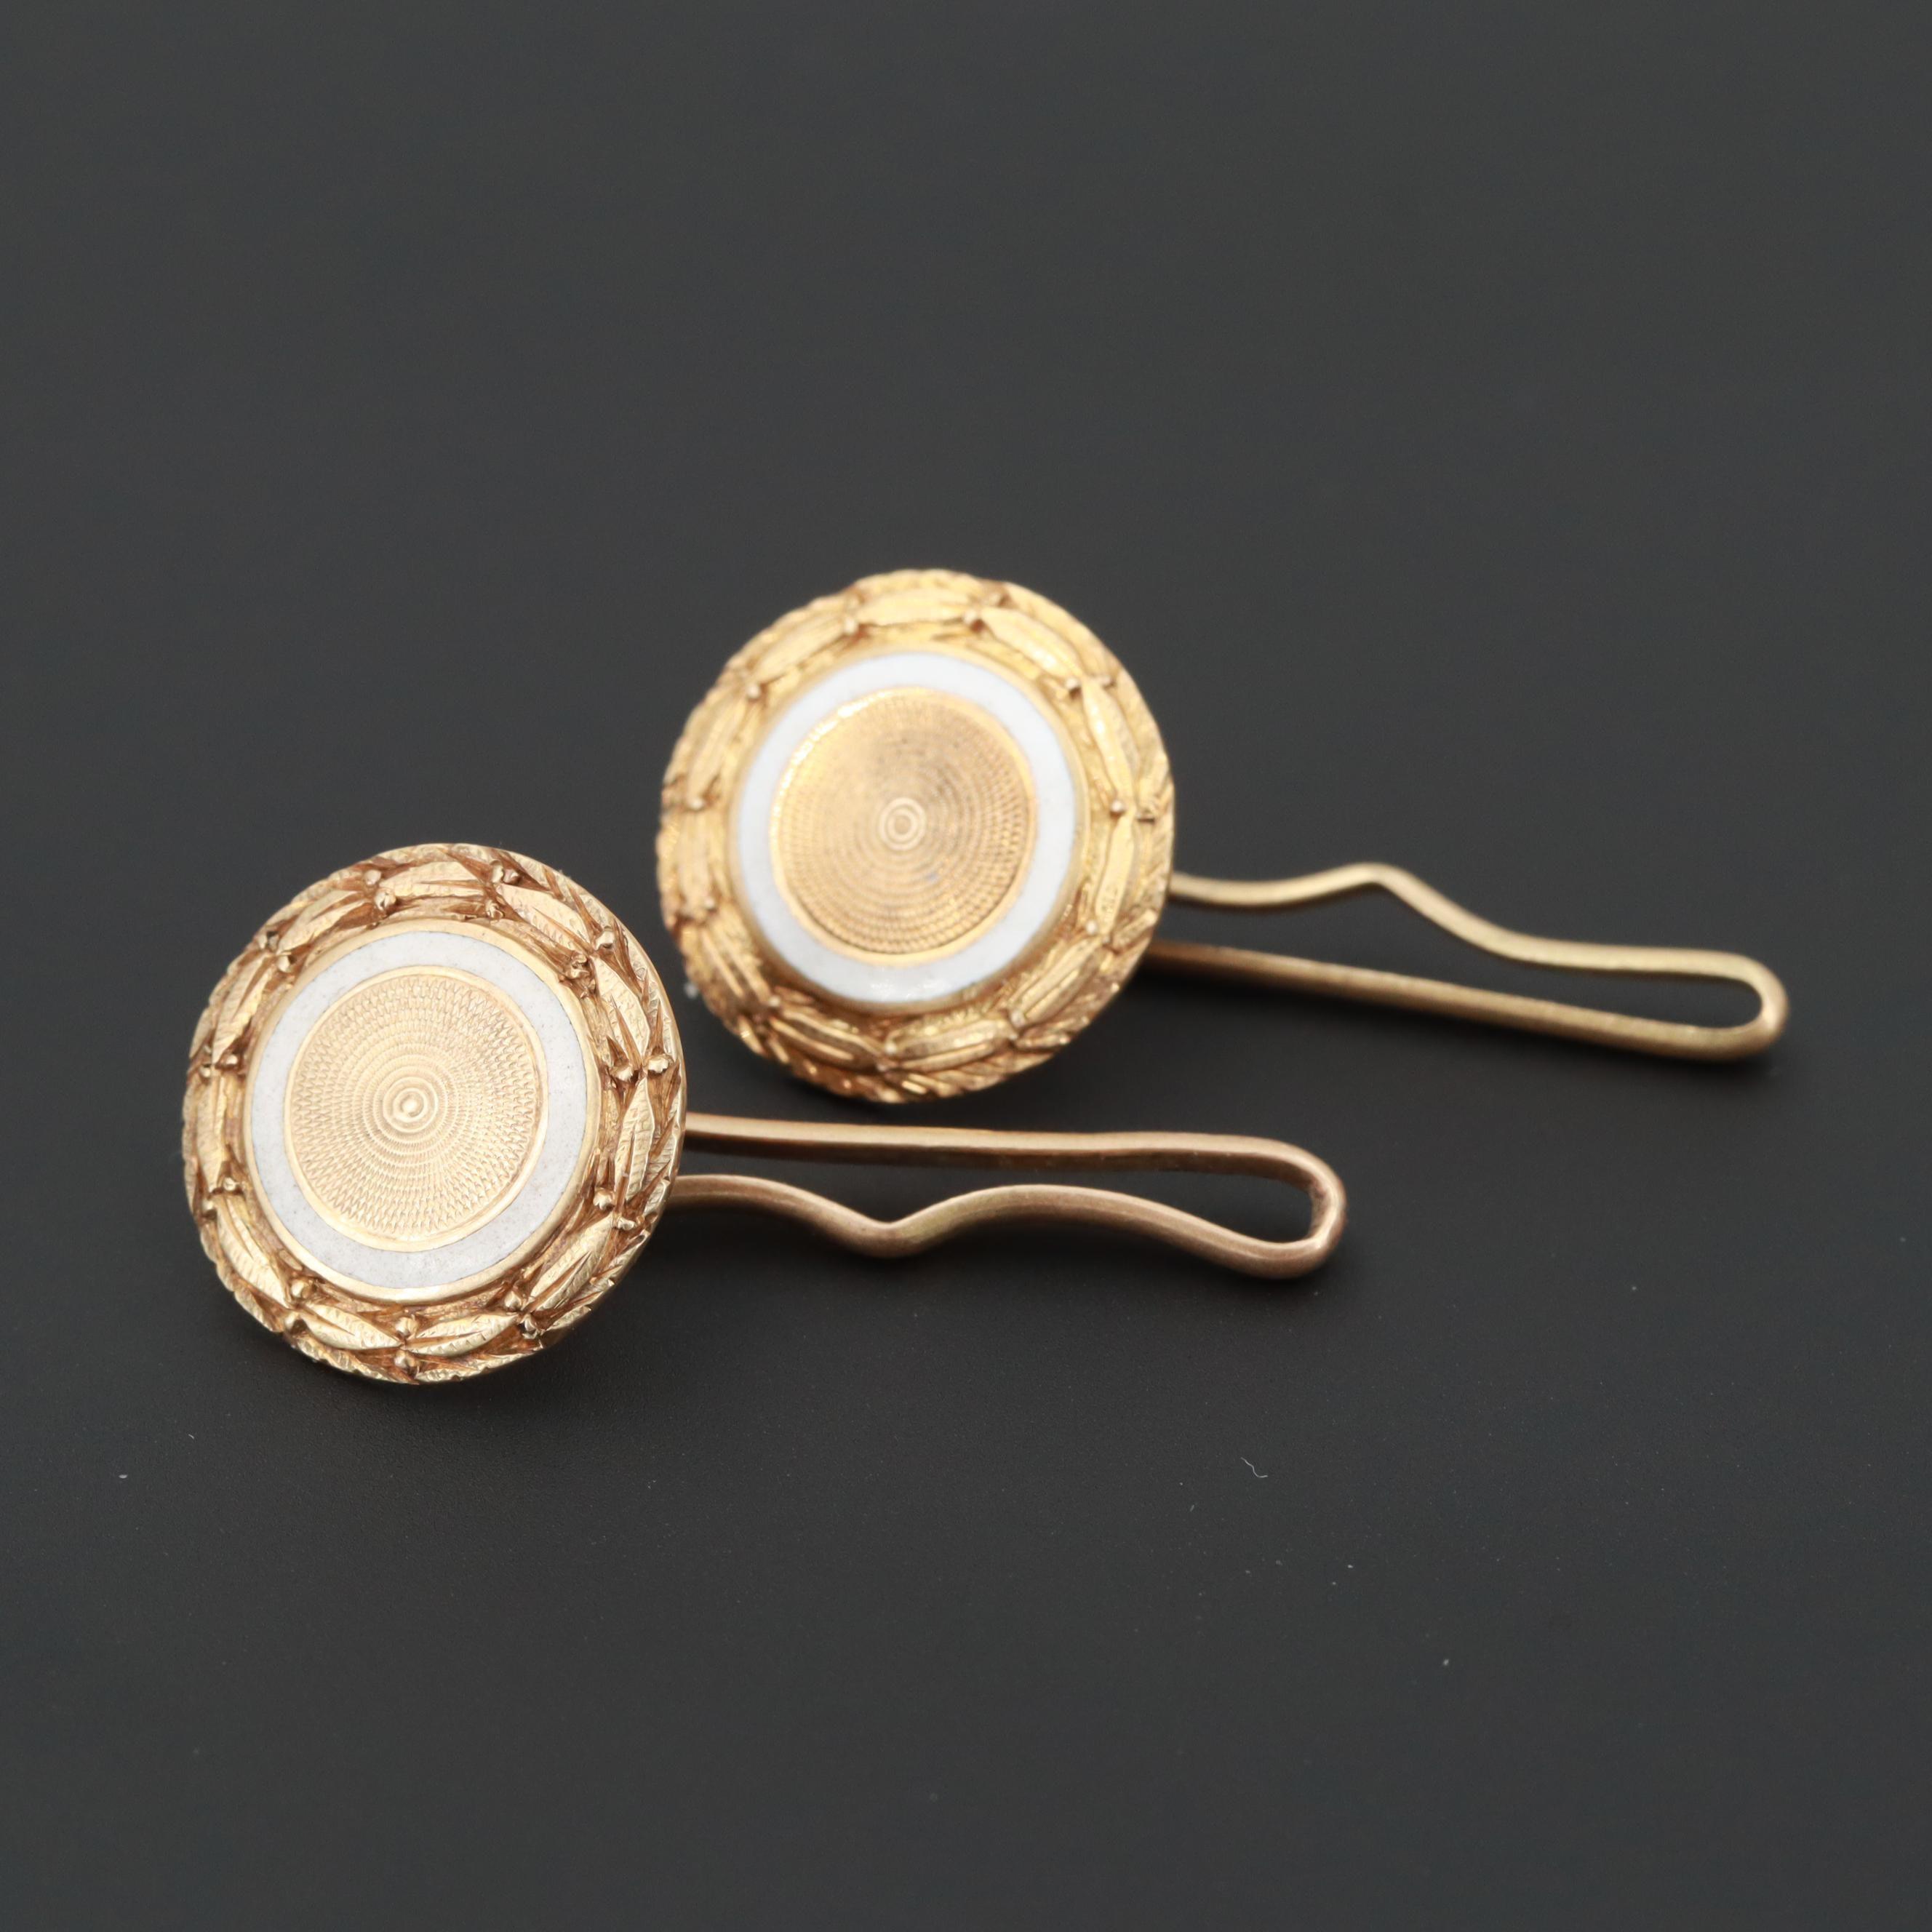 Edwardian Carrington & Company 14K Yellow Gold Enamel Button Stud Cufflinks